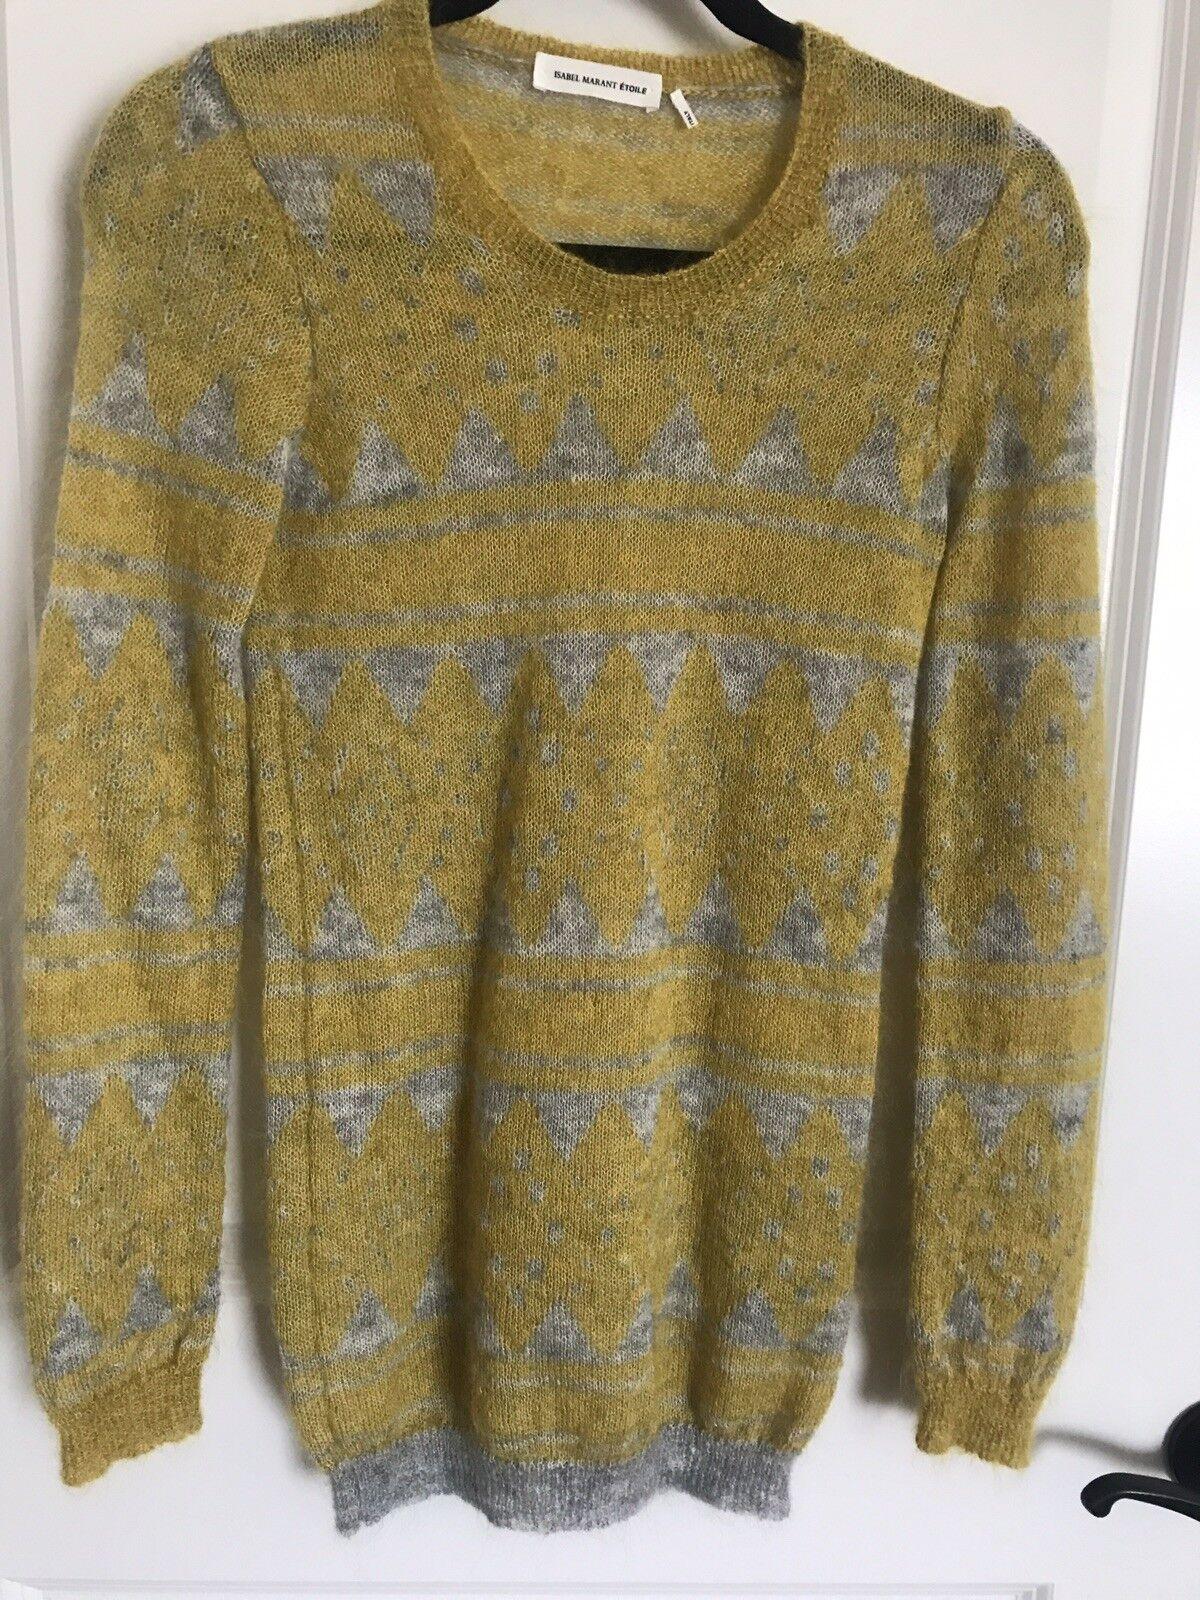 ISABEL MARANT ETOILE  Falk Mohair-Blend Sweater in FR 36 XS S